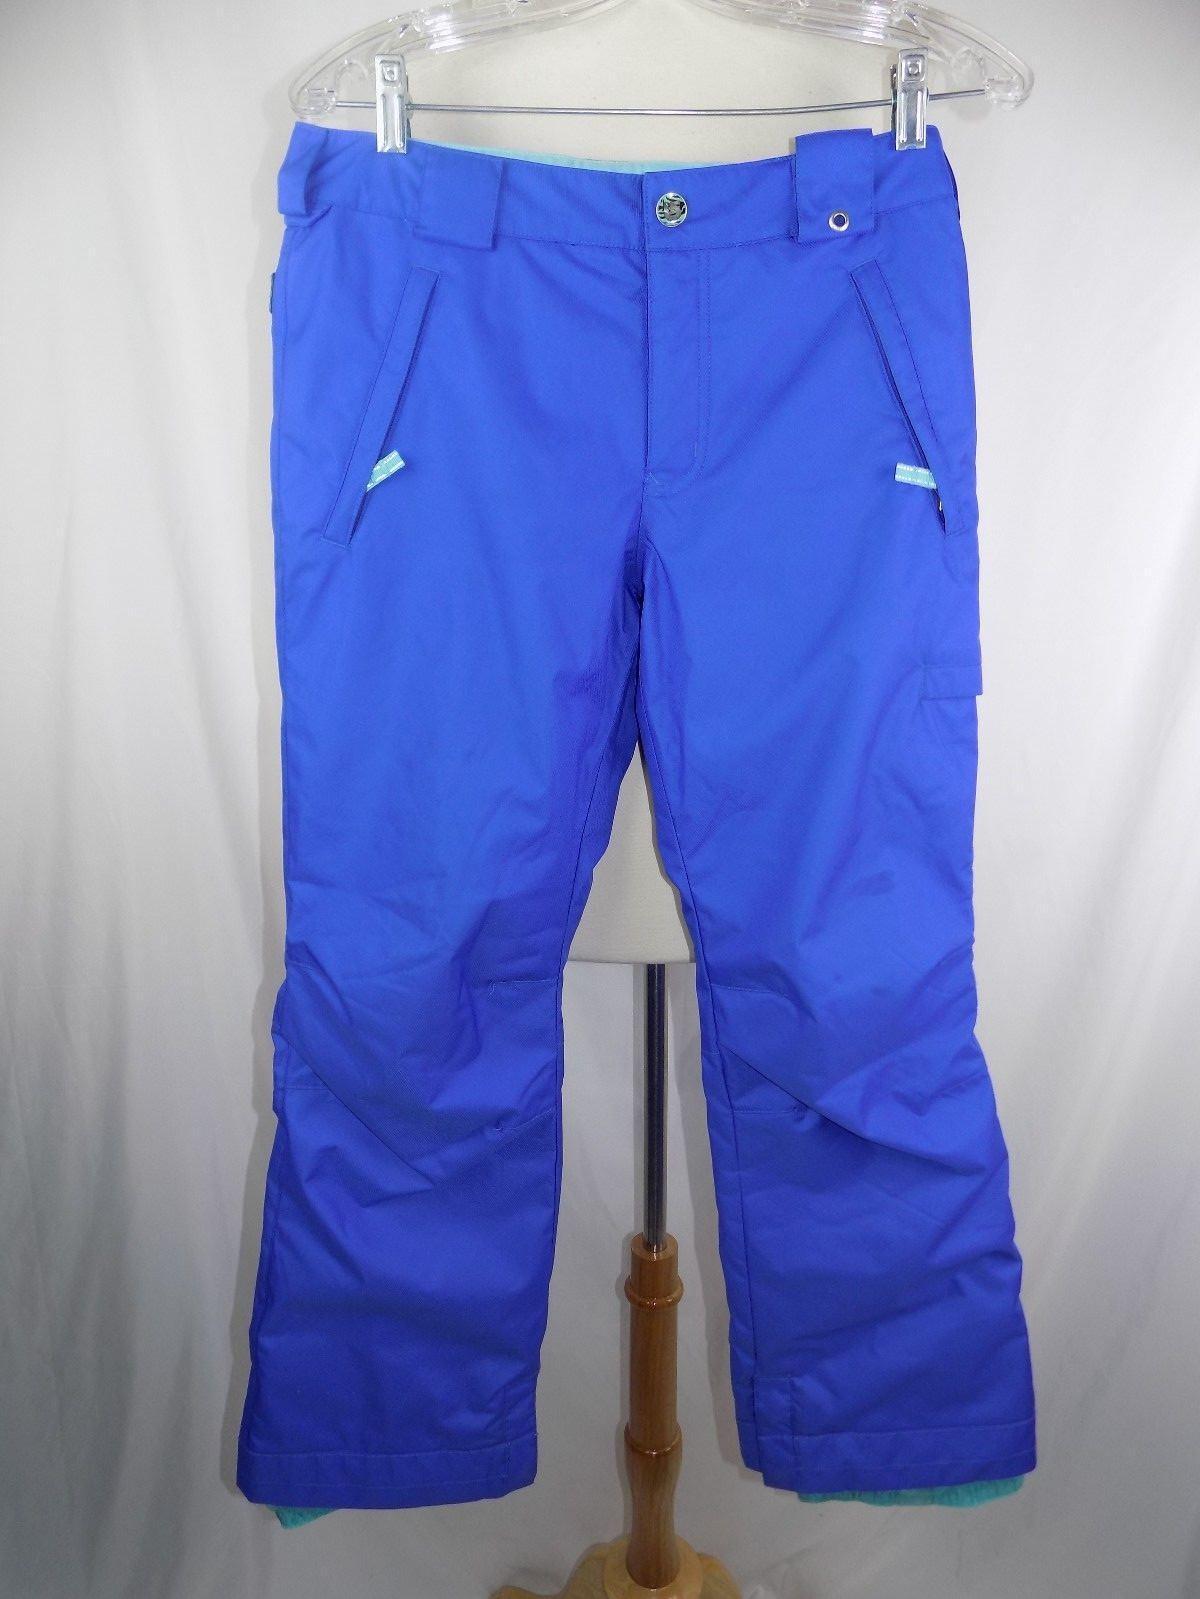 Burton Lined DryRide Ski SnowBoard blueE Pants Youth XL 30 x 29